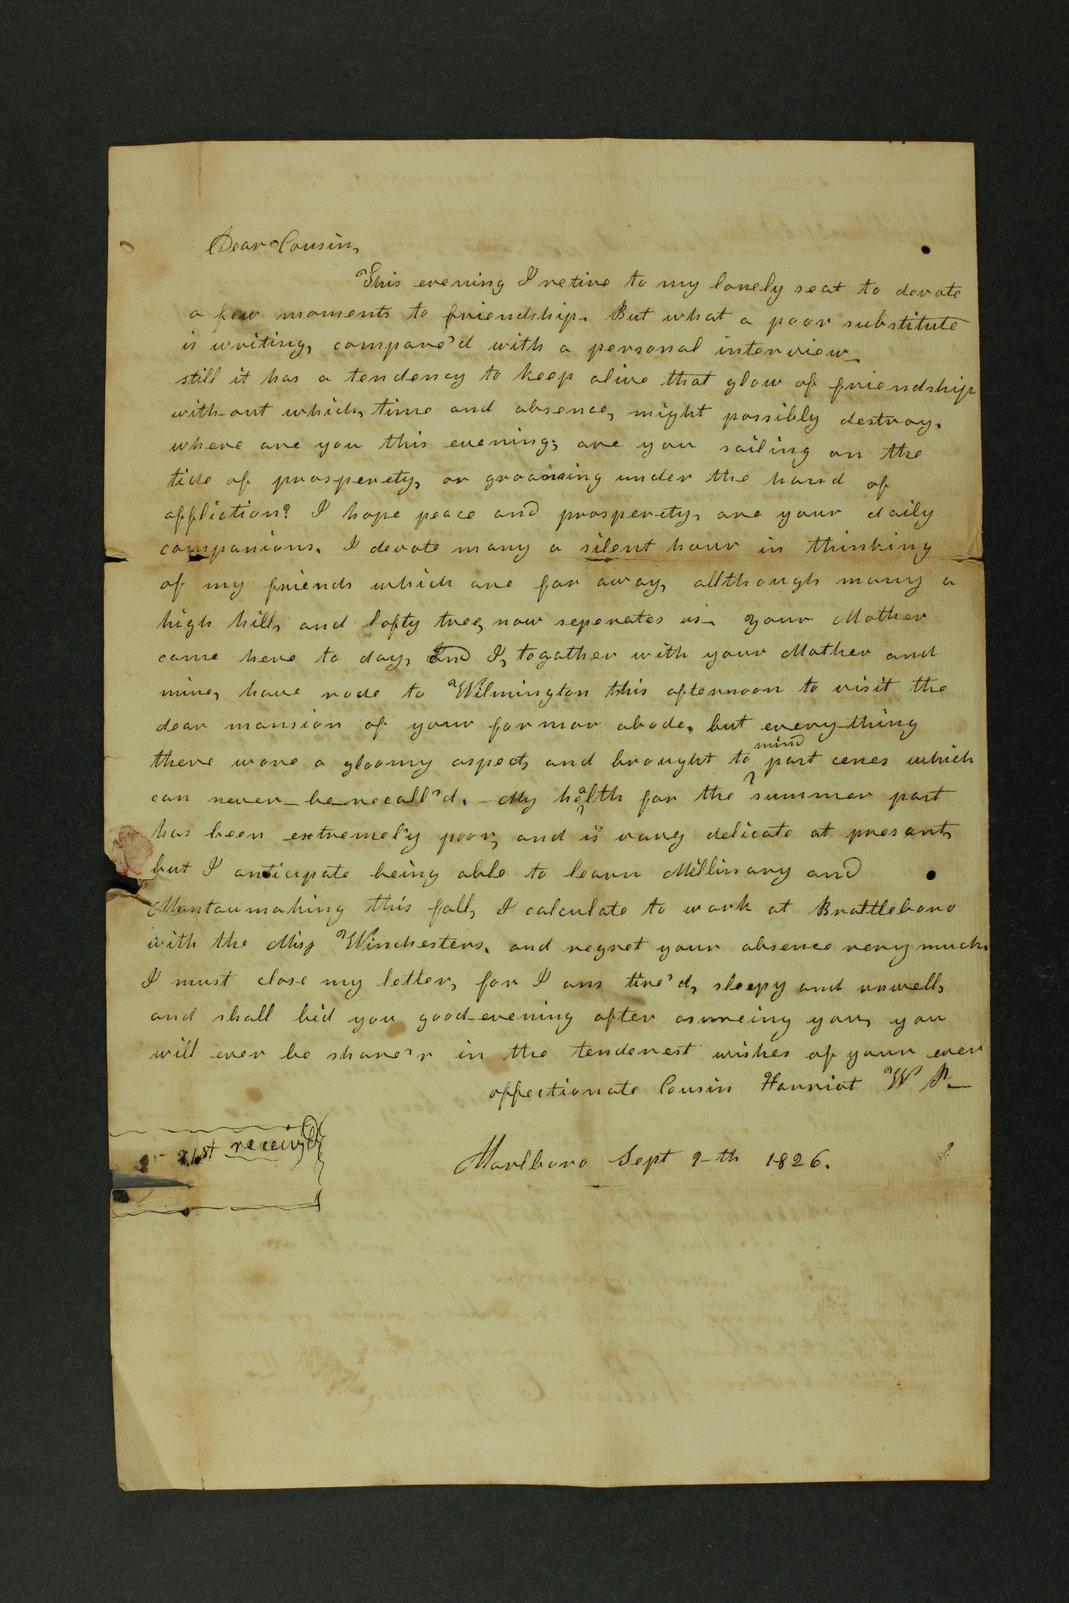 Isaac Goodnow correspondence - 1  [Box 1, Folder 1]